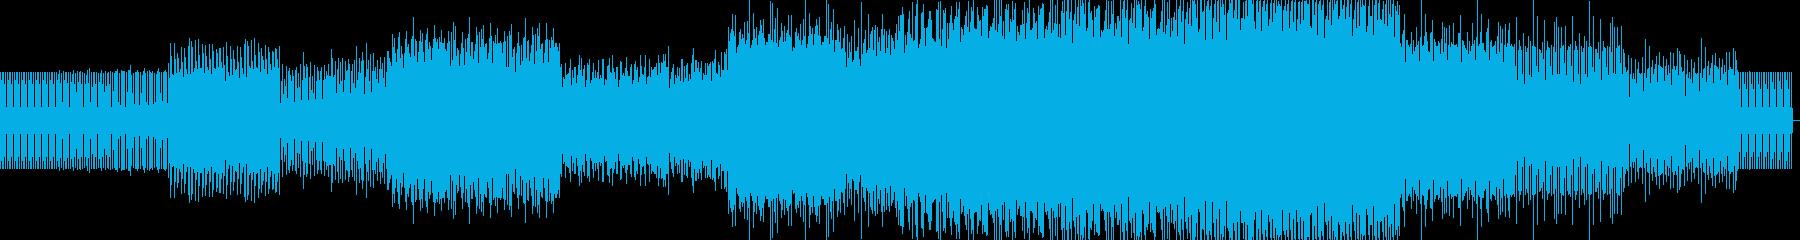 Strident、Resolute...の再生済みの波形